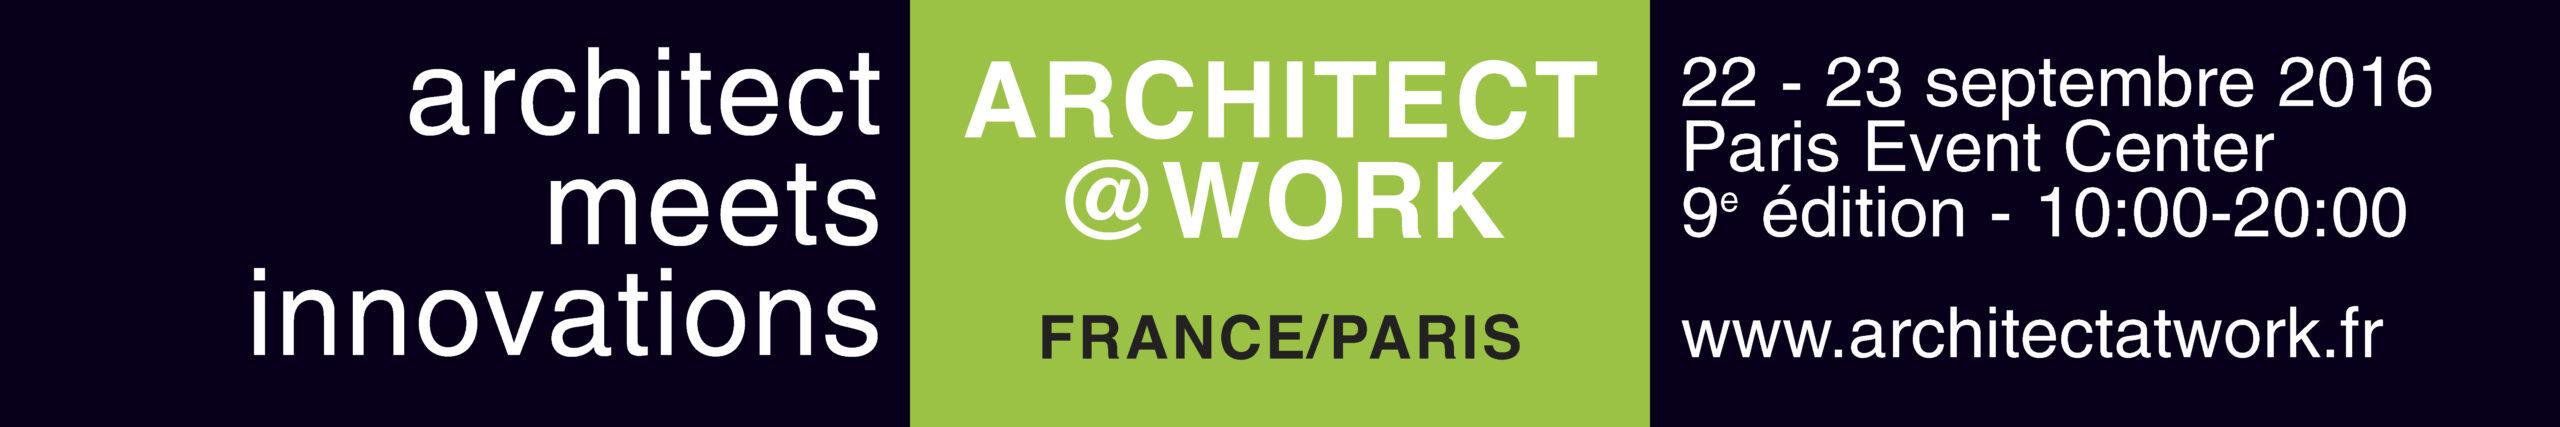 banniere-architect-at-work-paris-fr